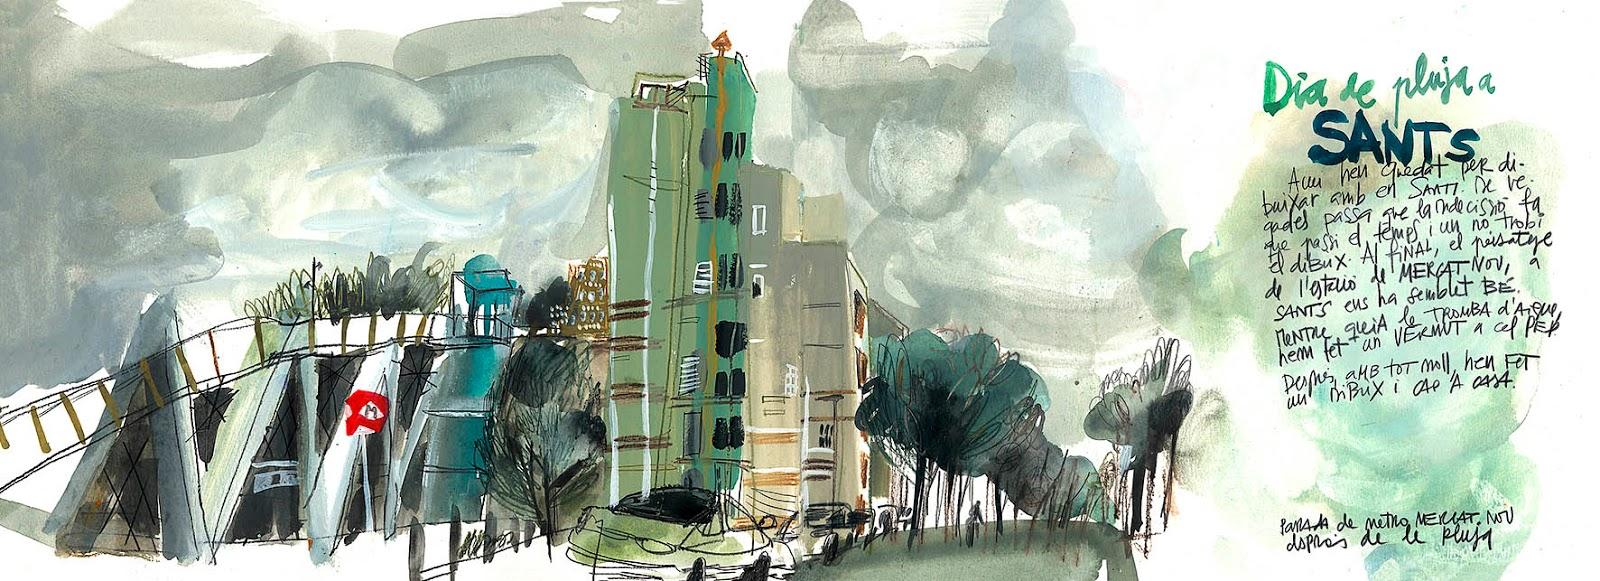 Big Gouache and Mixed Media Workshop: San Francisco | Urban Sketchers